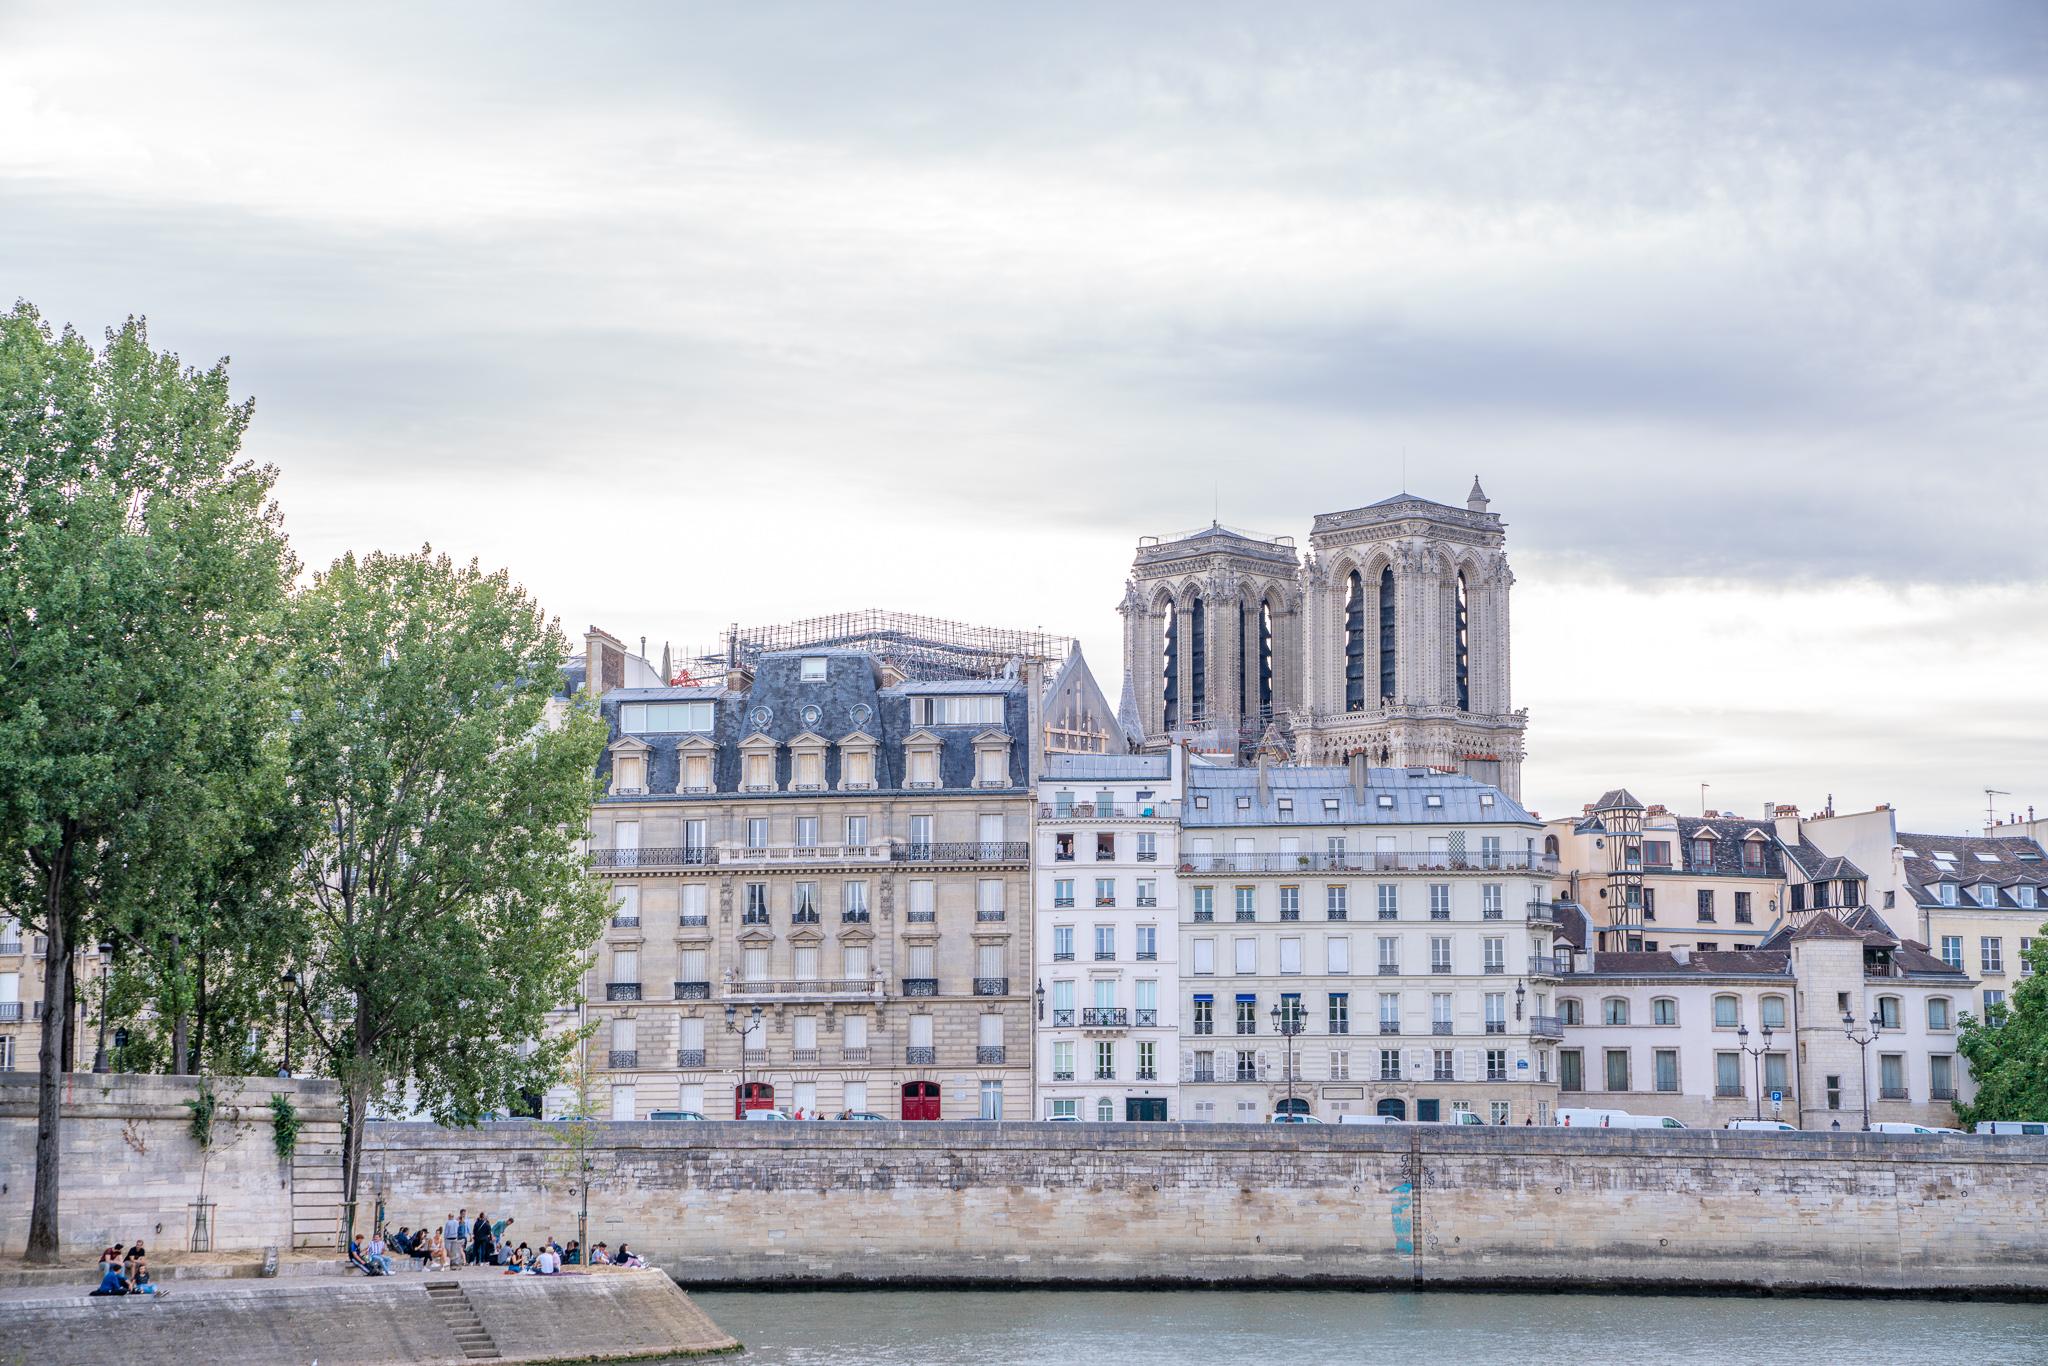 Buildings along the Seine river in Paris, France